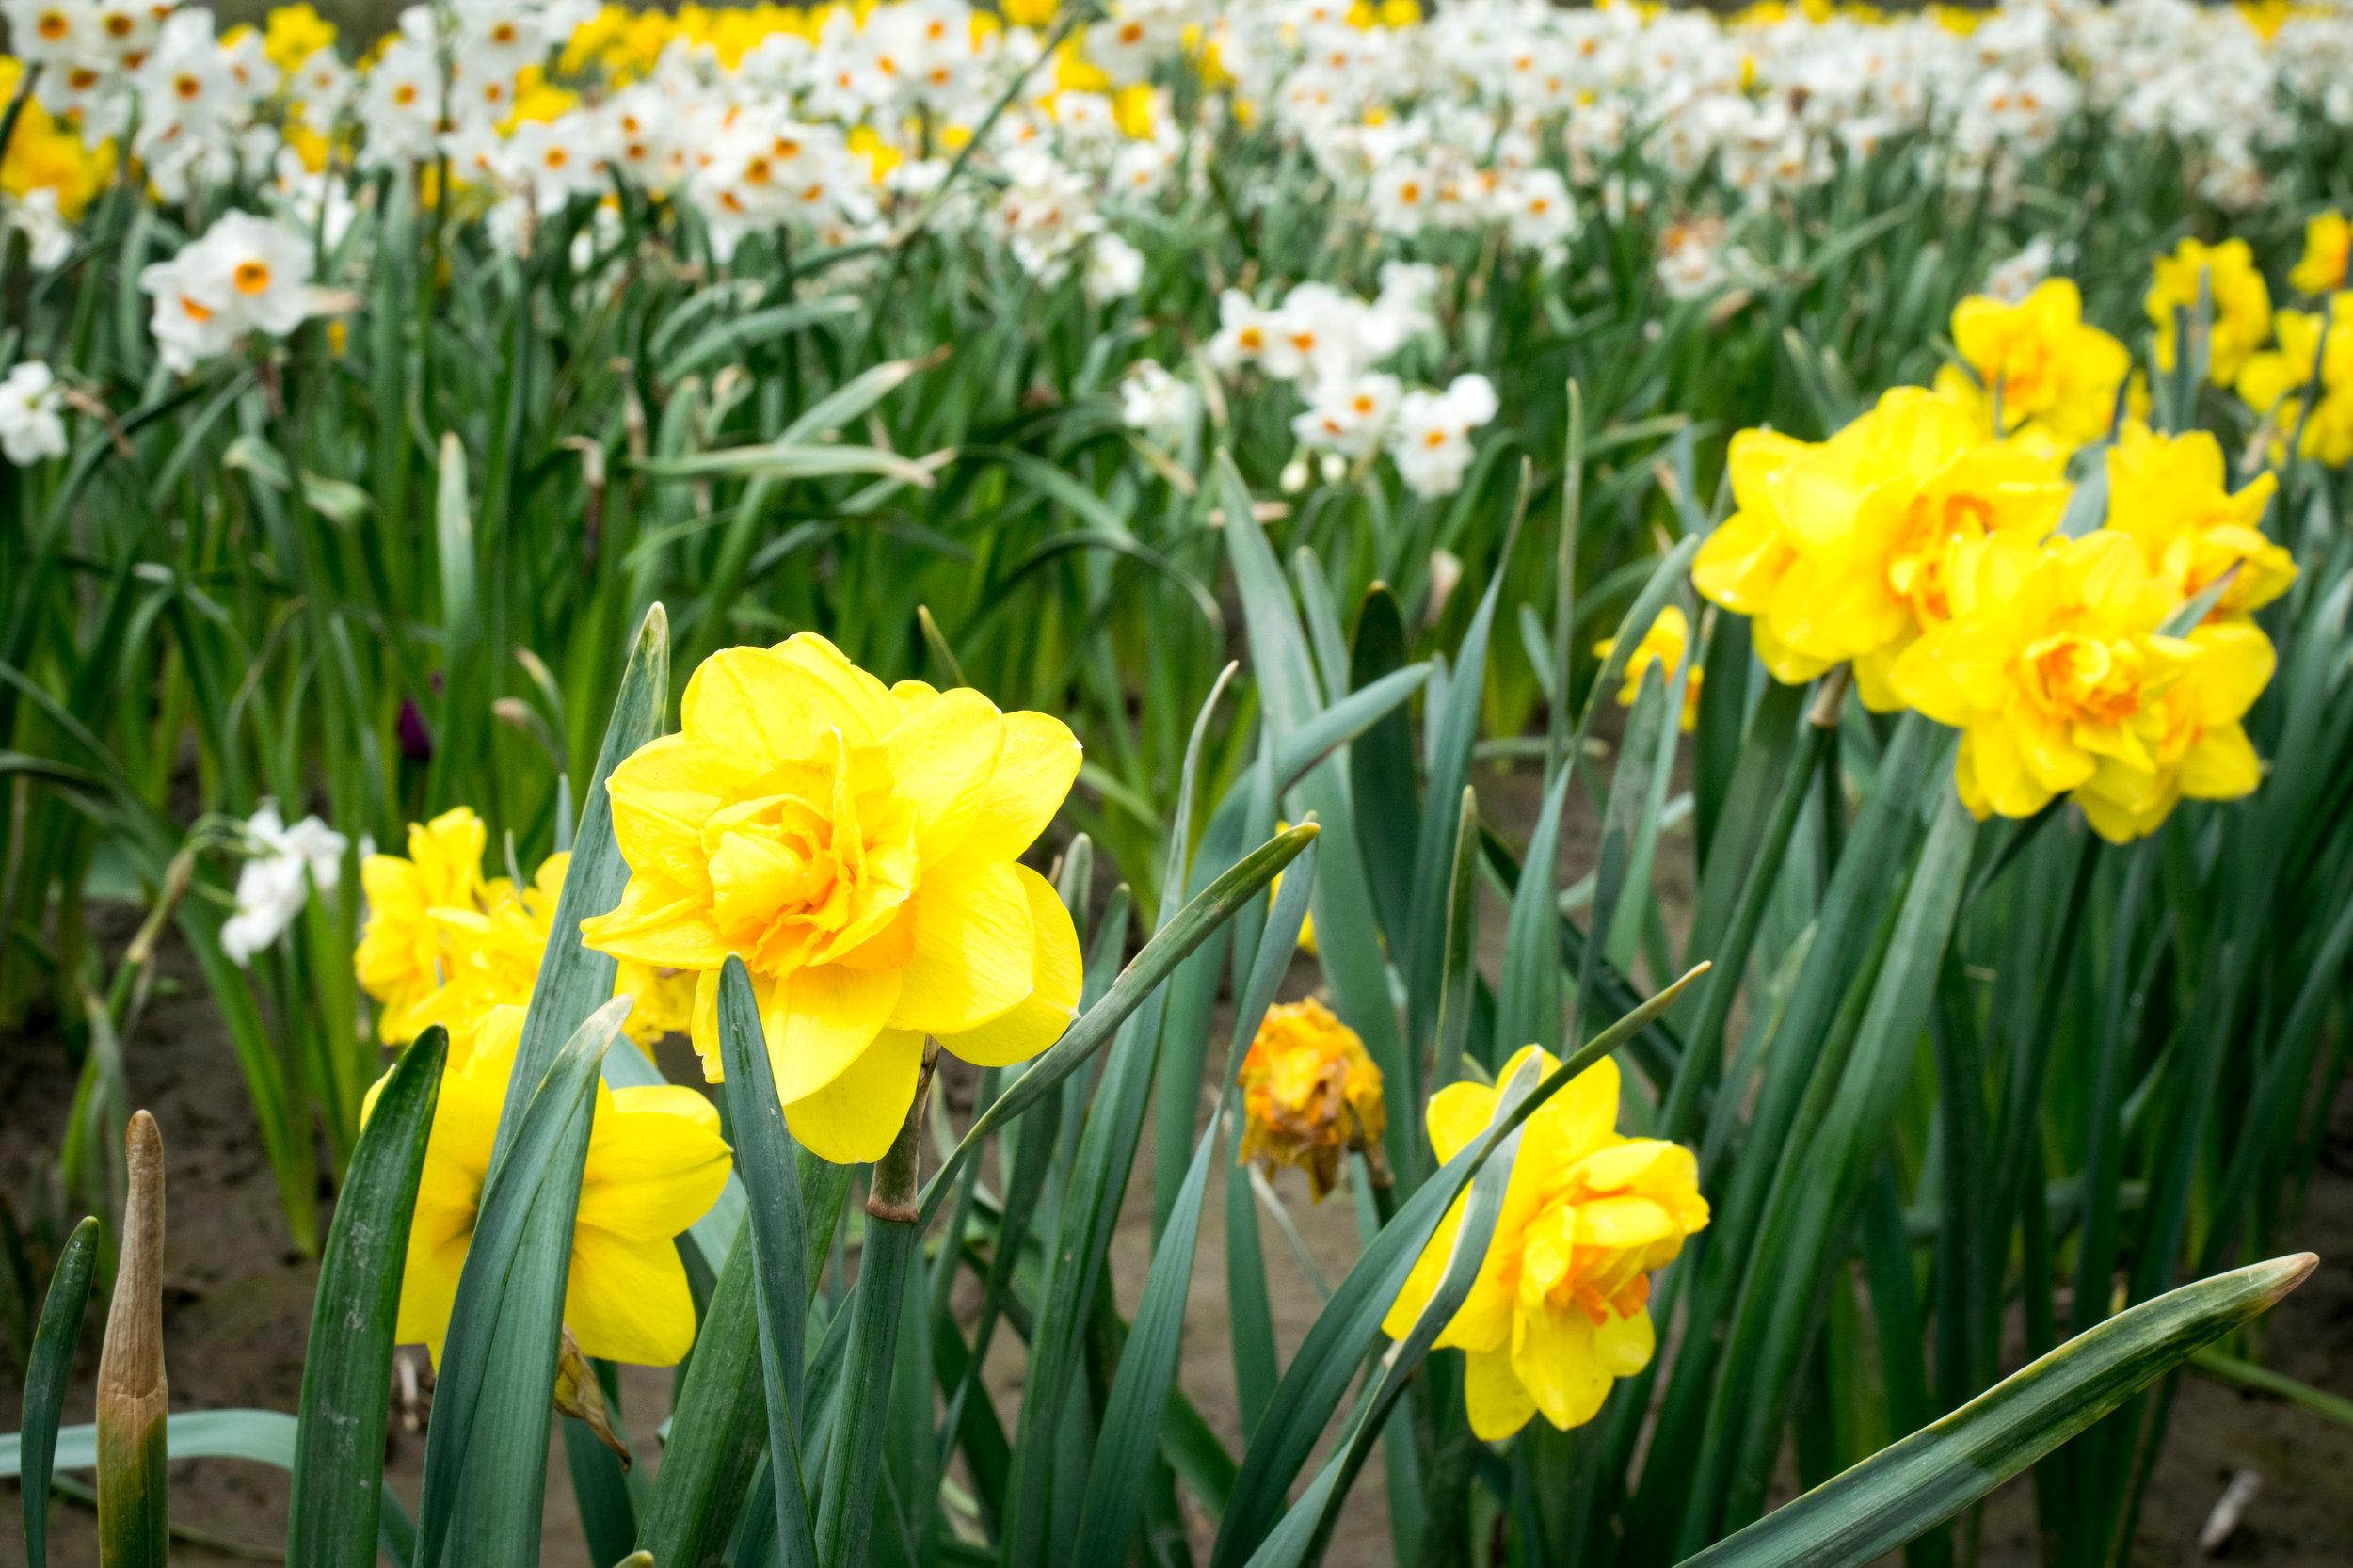 Daffodils at the Chilliwack Tulip Festival